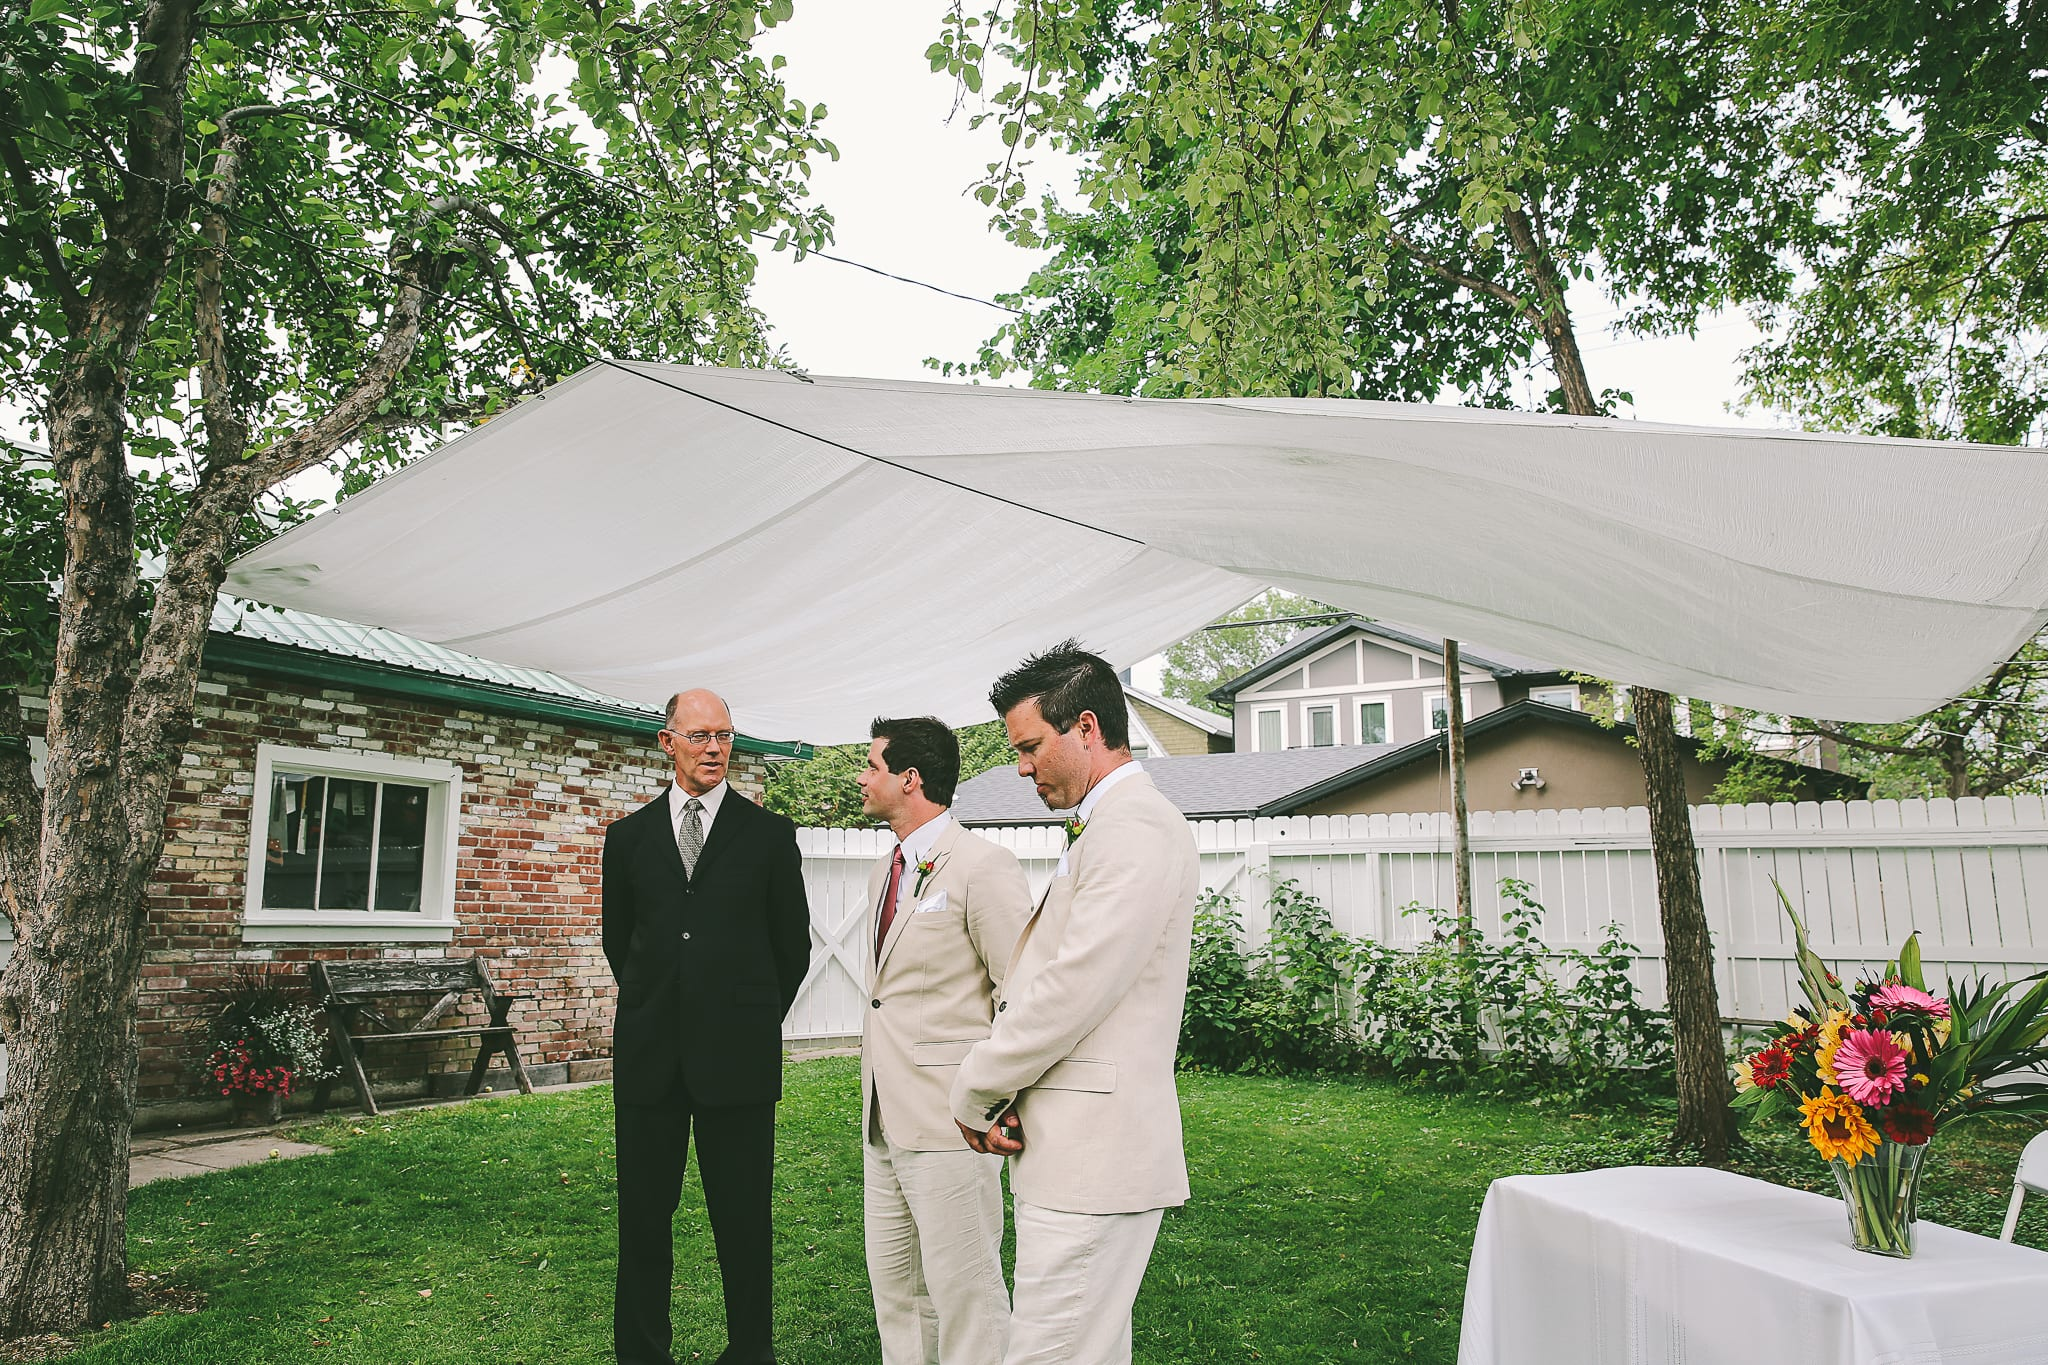 annie u0026 dominic u0027s backyard wedding in calgary winter lotus